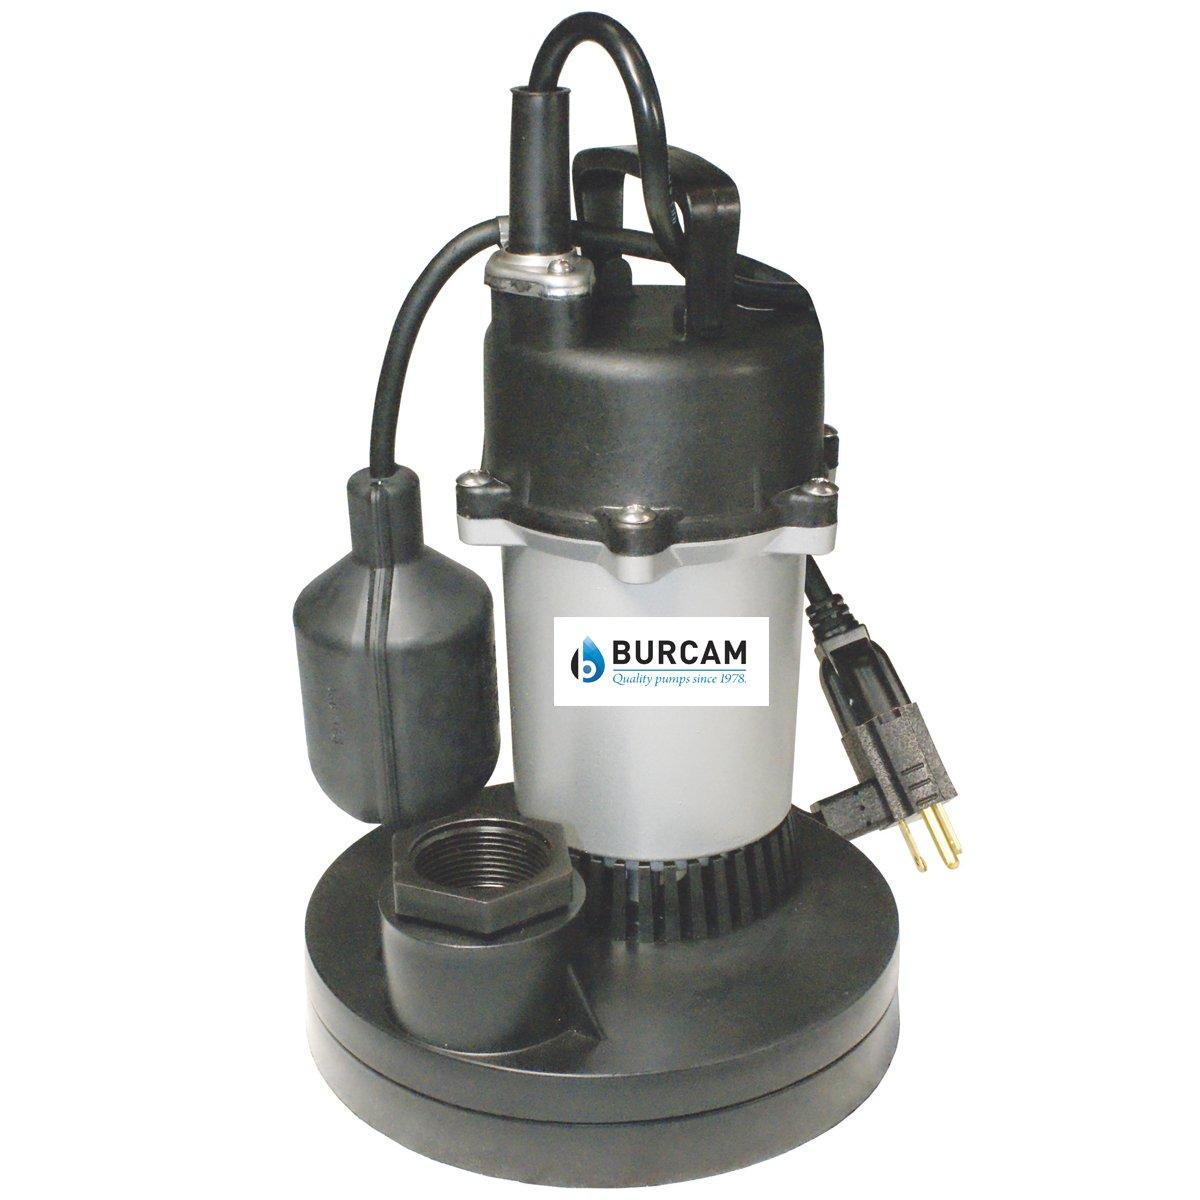 BURCAM 300700Z 1/2 HP Zinc Series Submersible Sump Pump 1-1/2'' Npt Silver